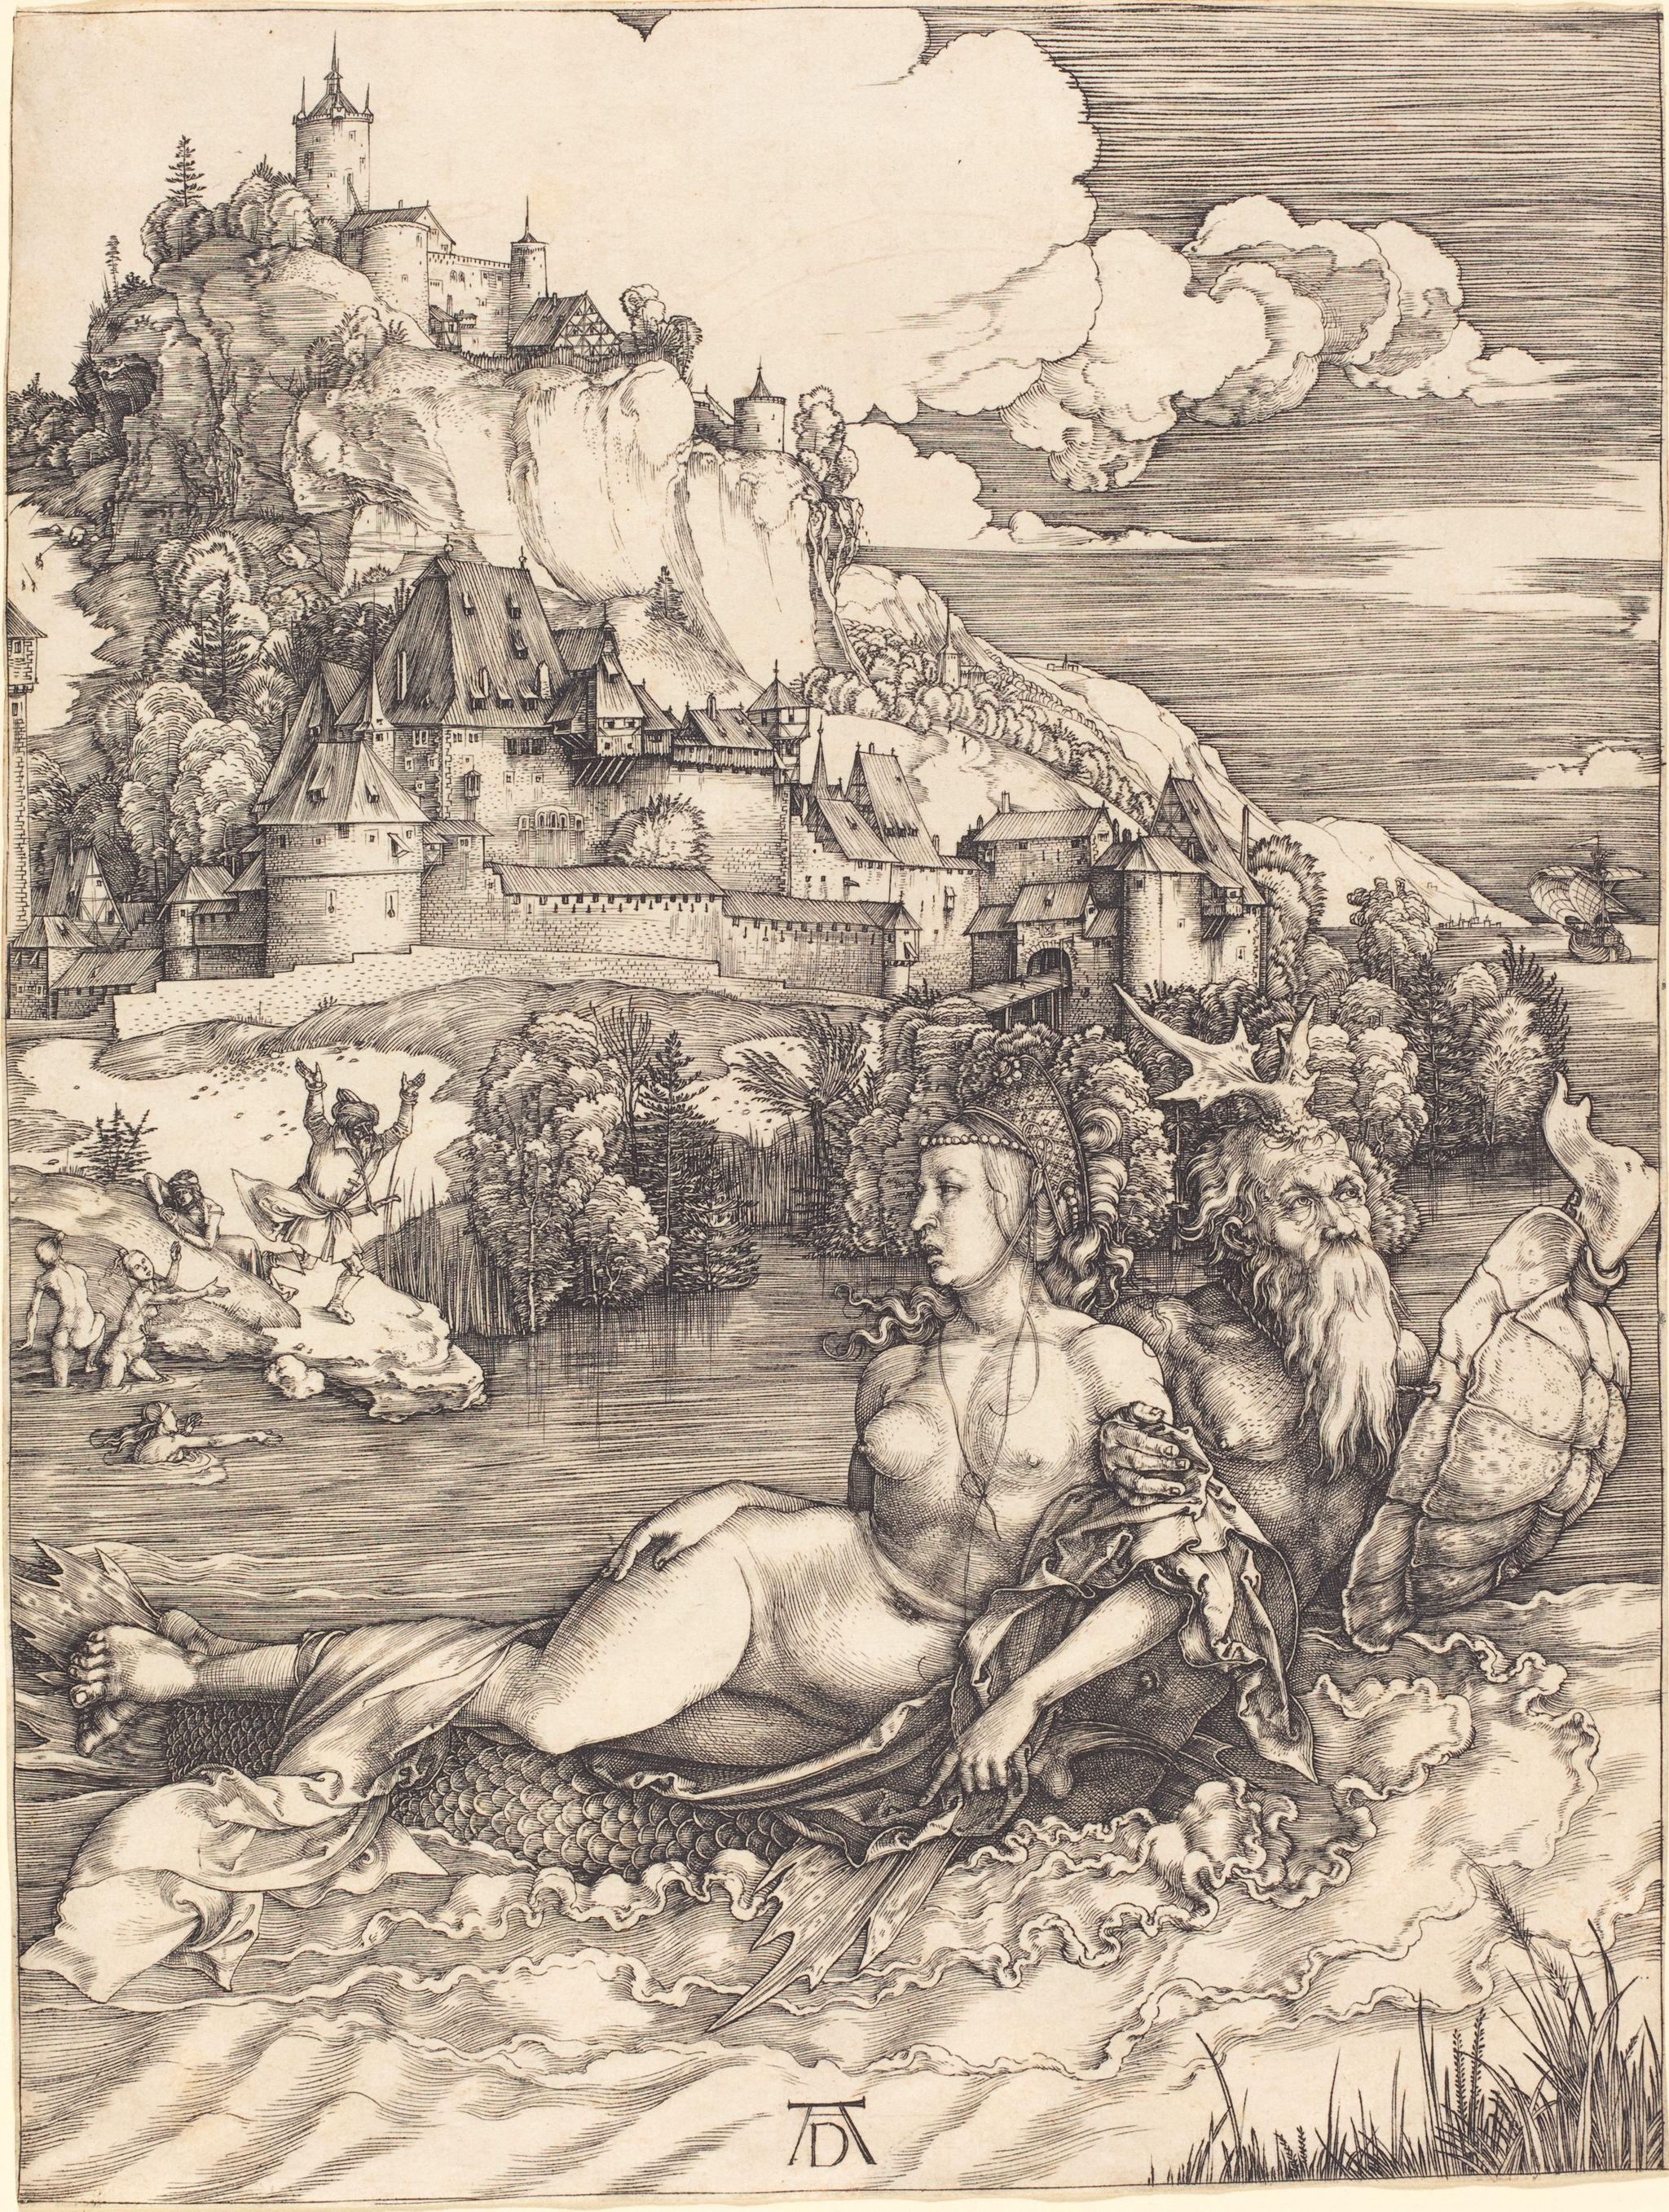 Albrecht Dürer - Sea Monster (Das Meerwunder) (NGA 1943.3.3483)